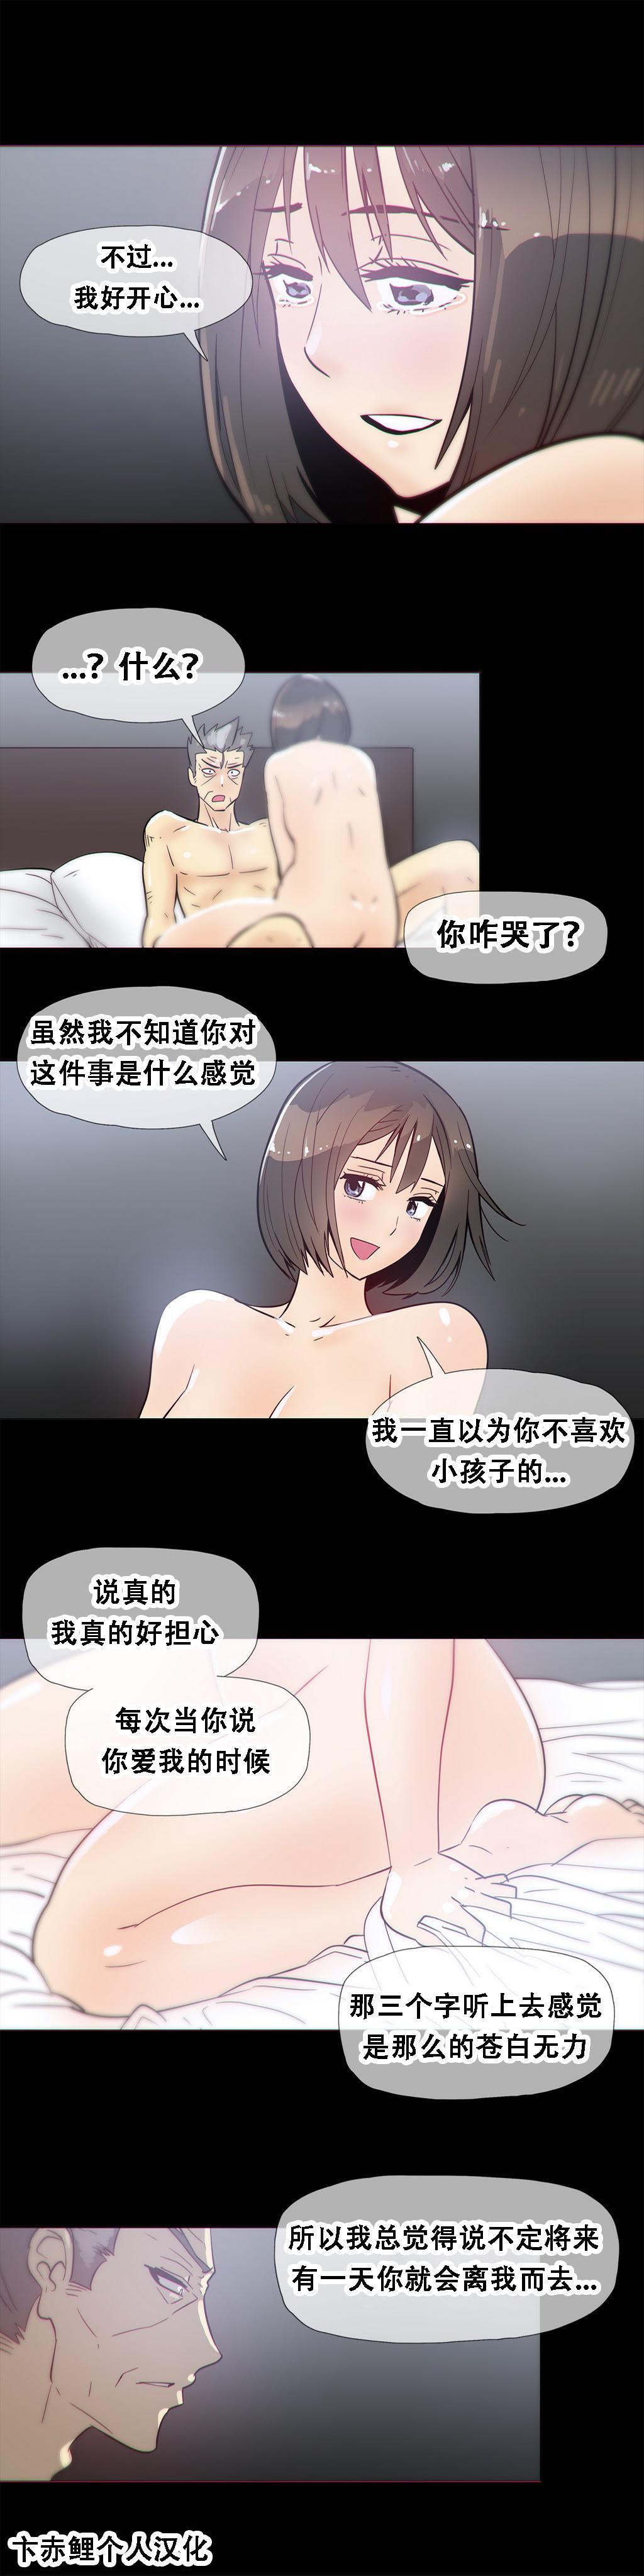 HouseHold Affairs 【卞赤鲤个人汉化】1~21话(持续更新中) 390